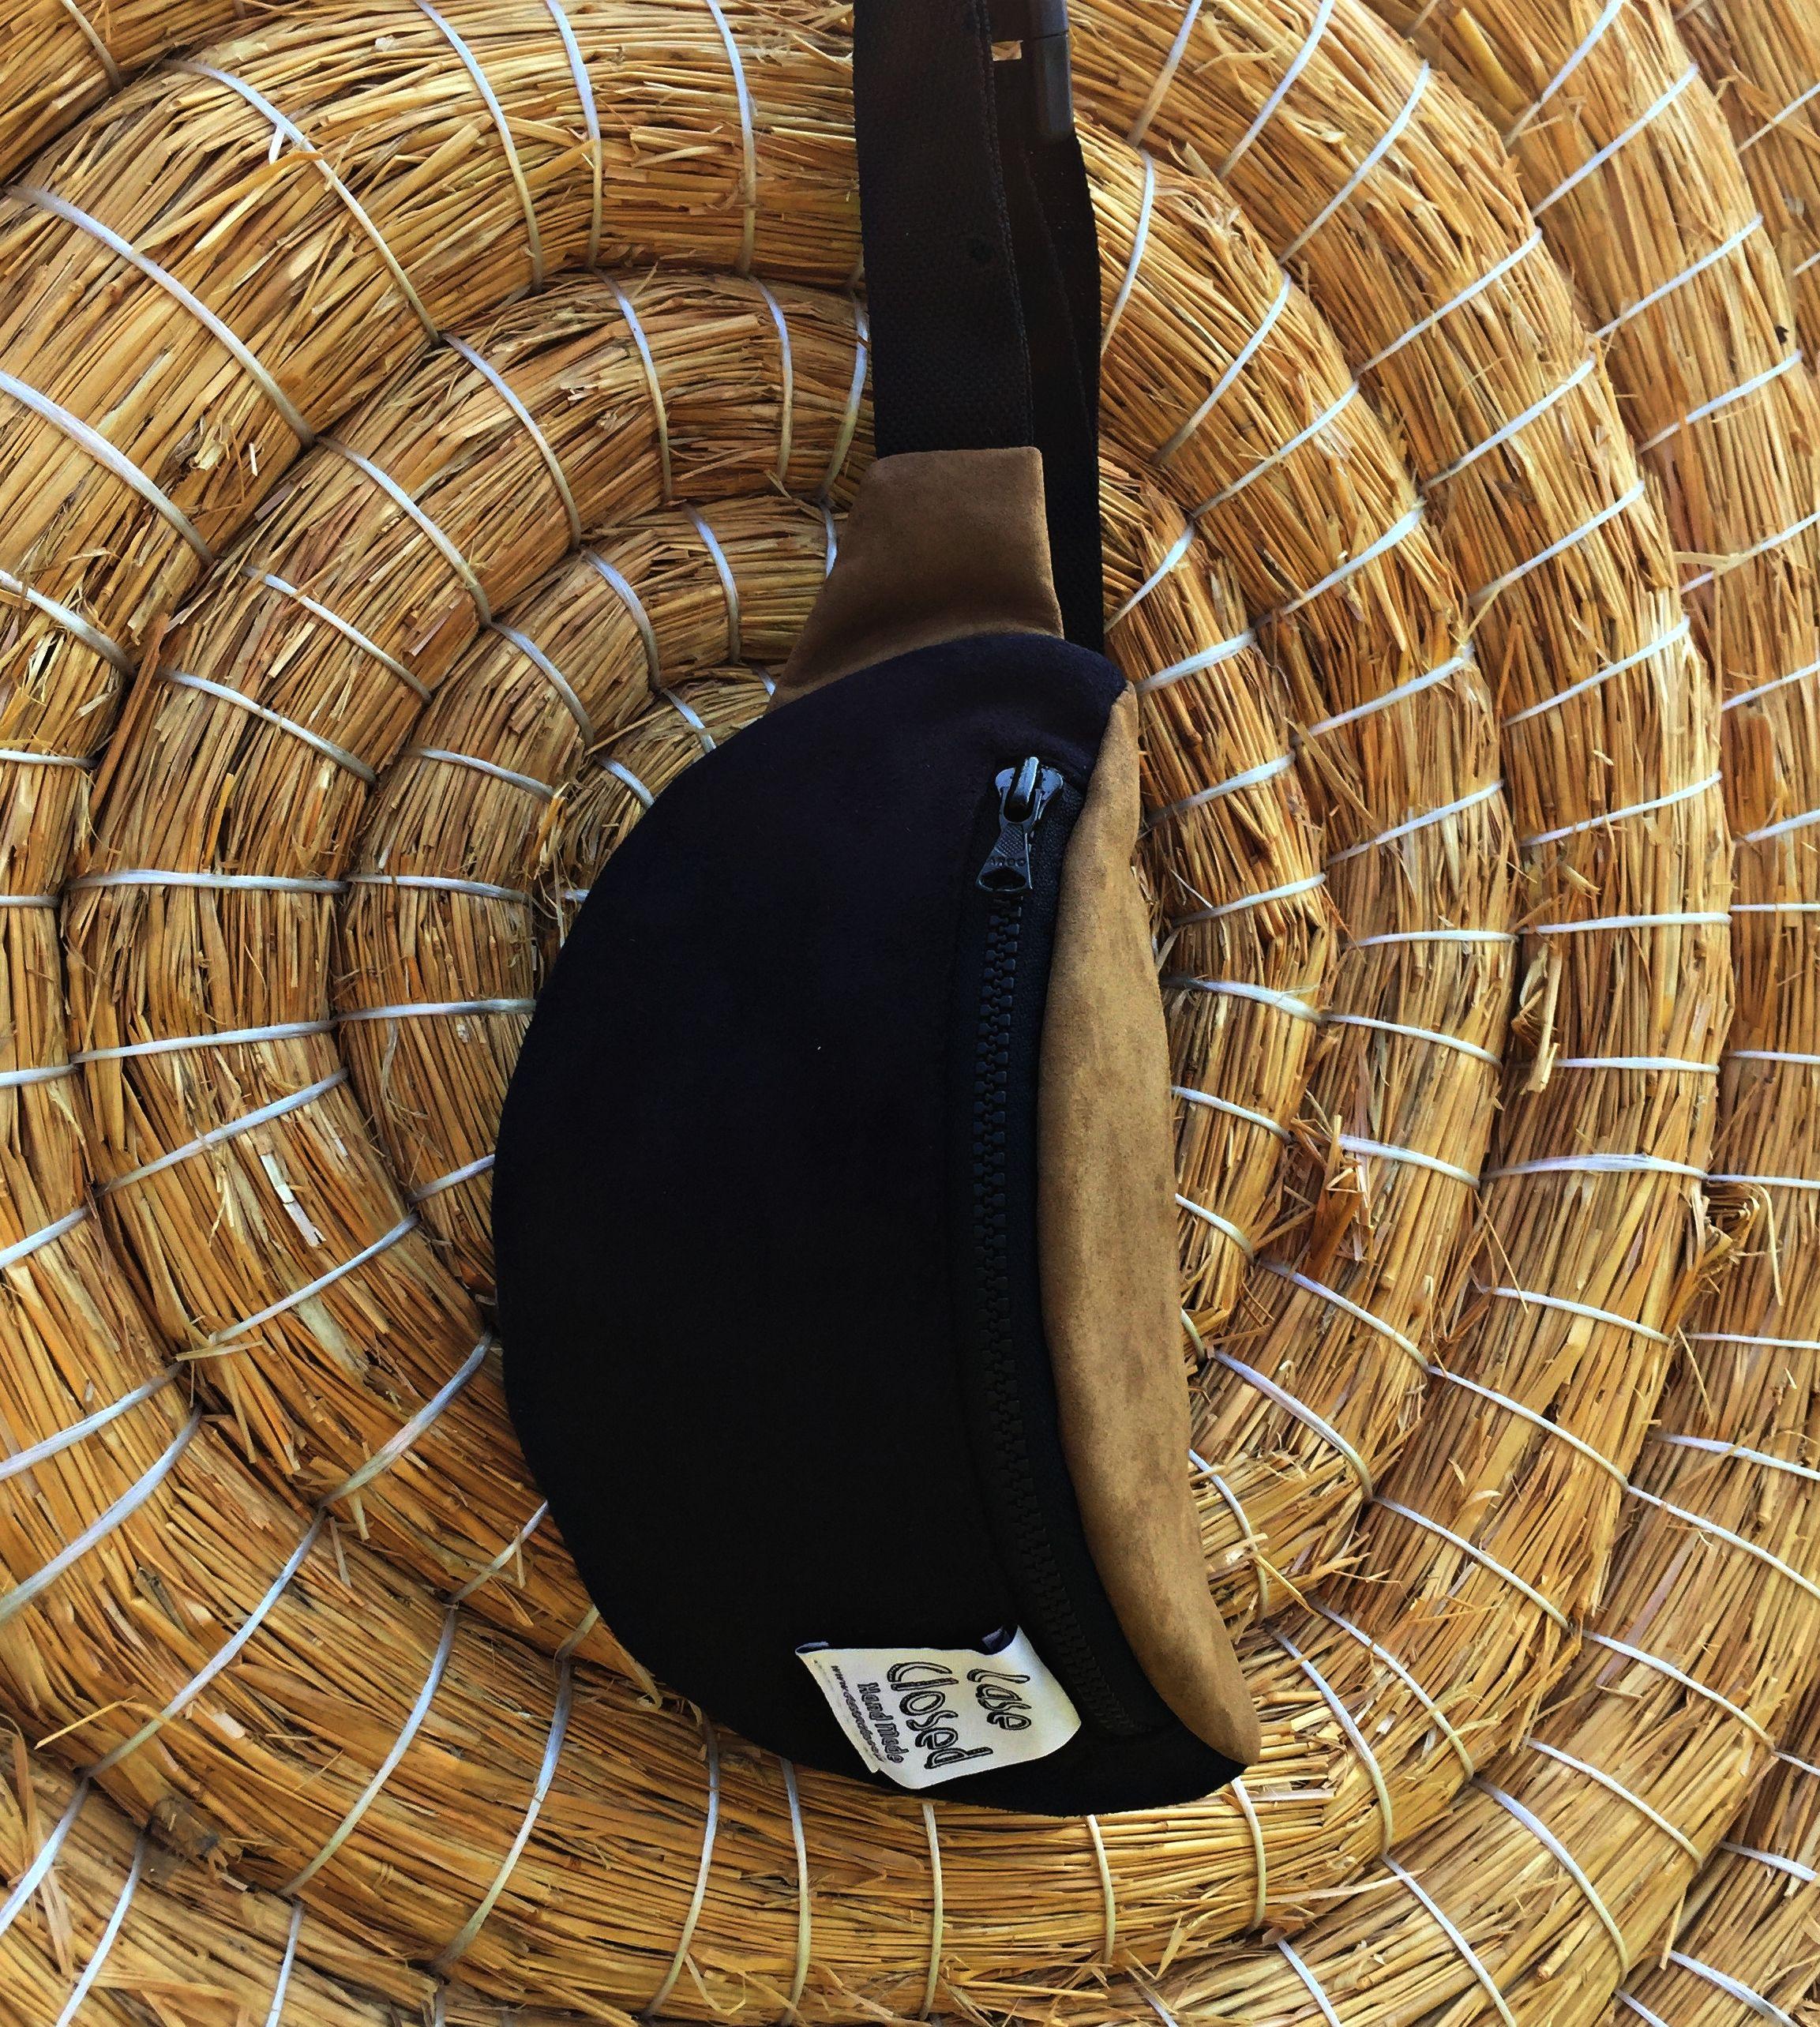 Atomic Redster Ski Gear Travelbag Ski Gear Skiing Travel Bags